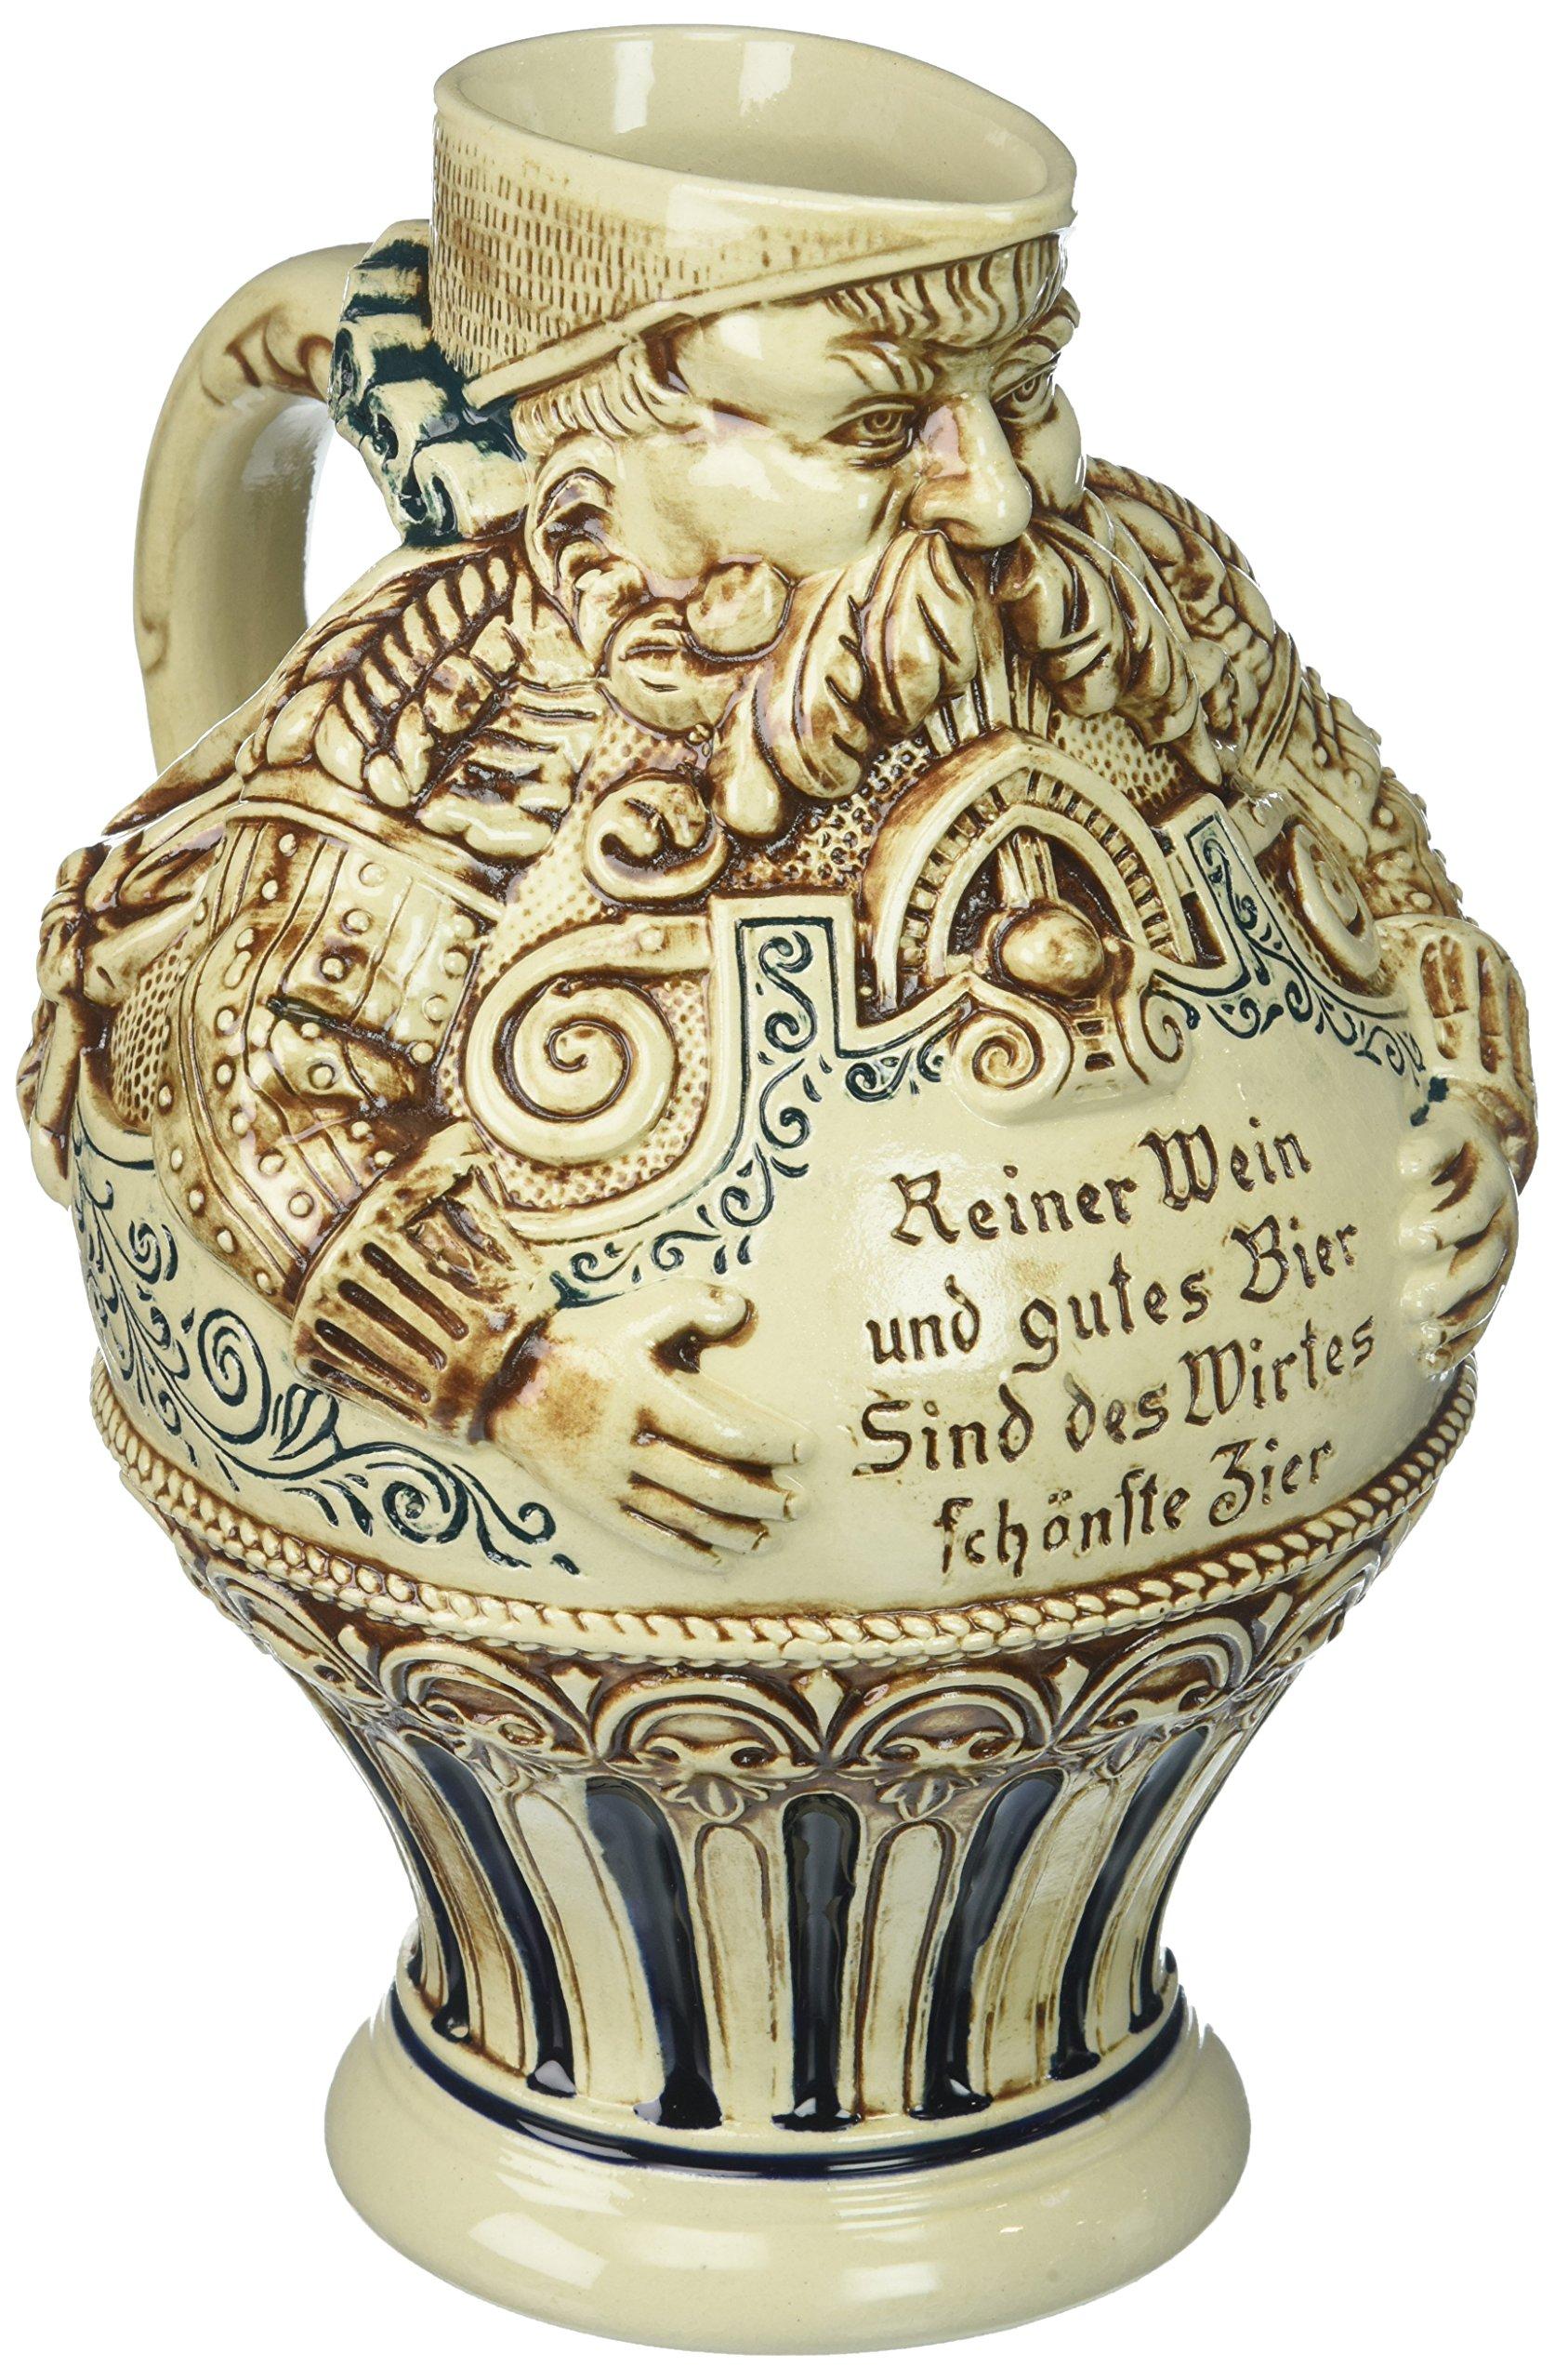 M. CORNELL IMPORTERS 6446 Bartmann Krug, German Stoneware Antique Jug